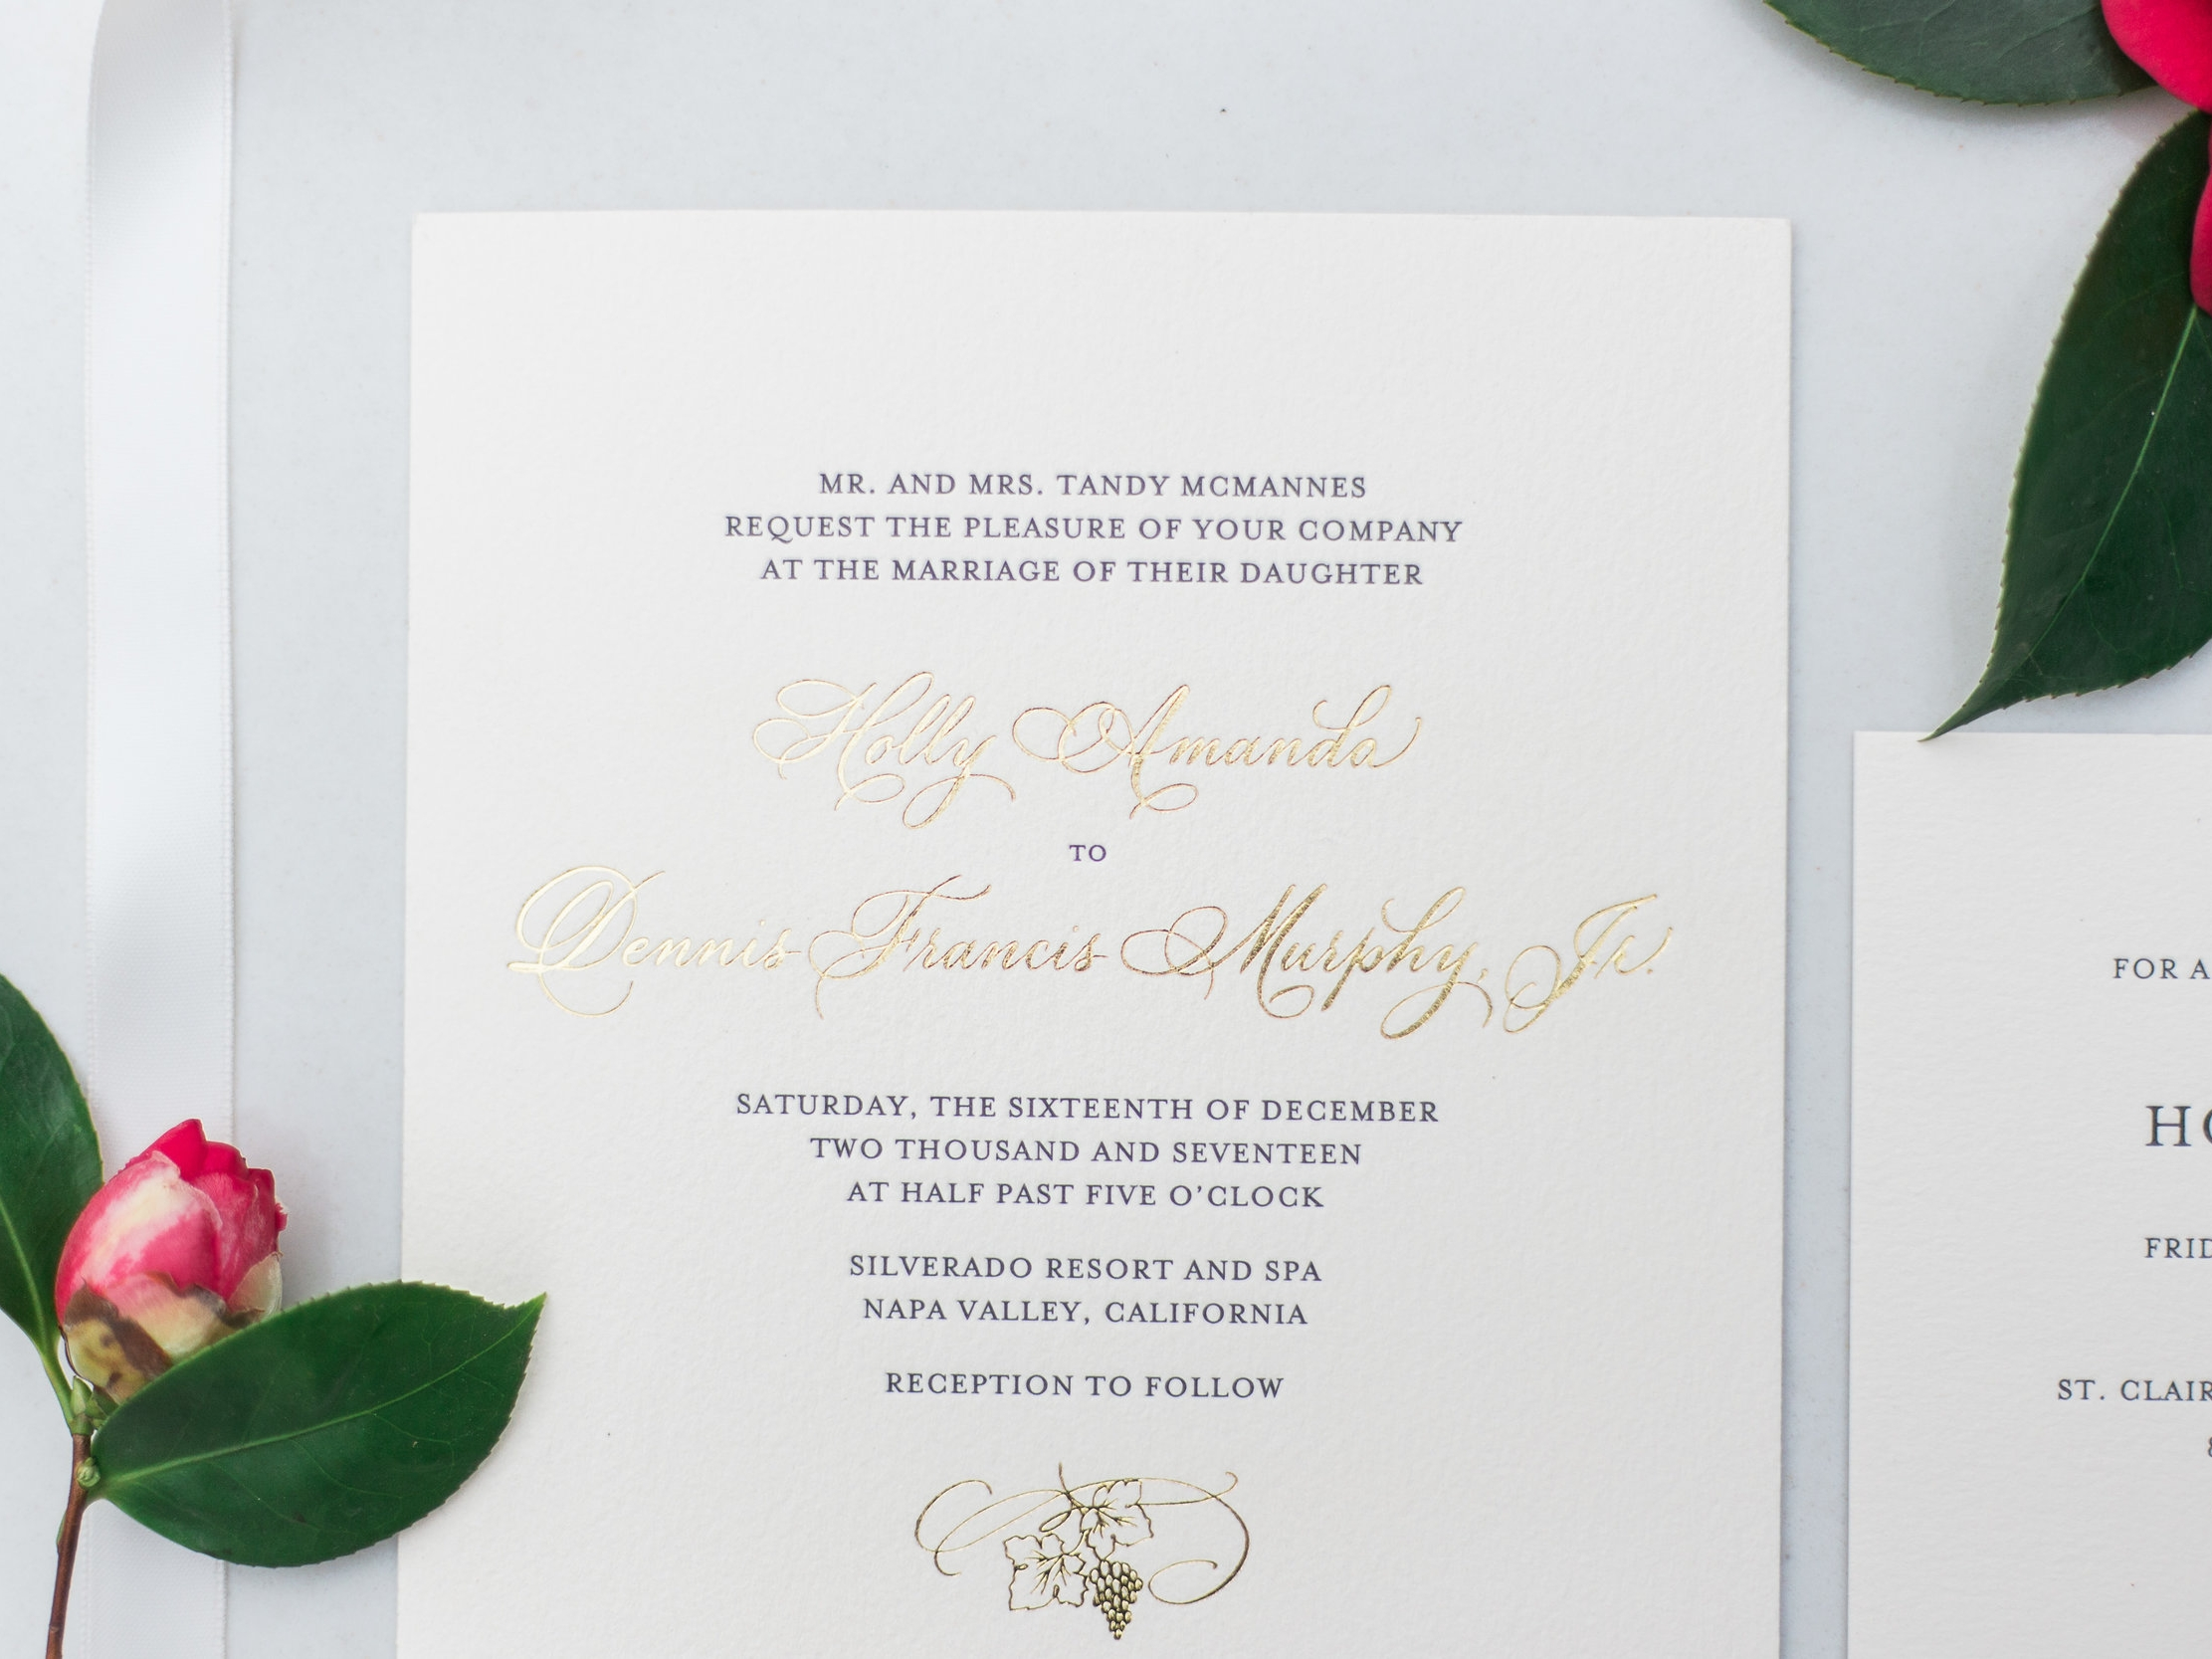 Invitation-Suite-by-JBJ-Pictures-4.jpg